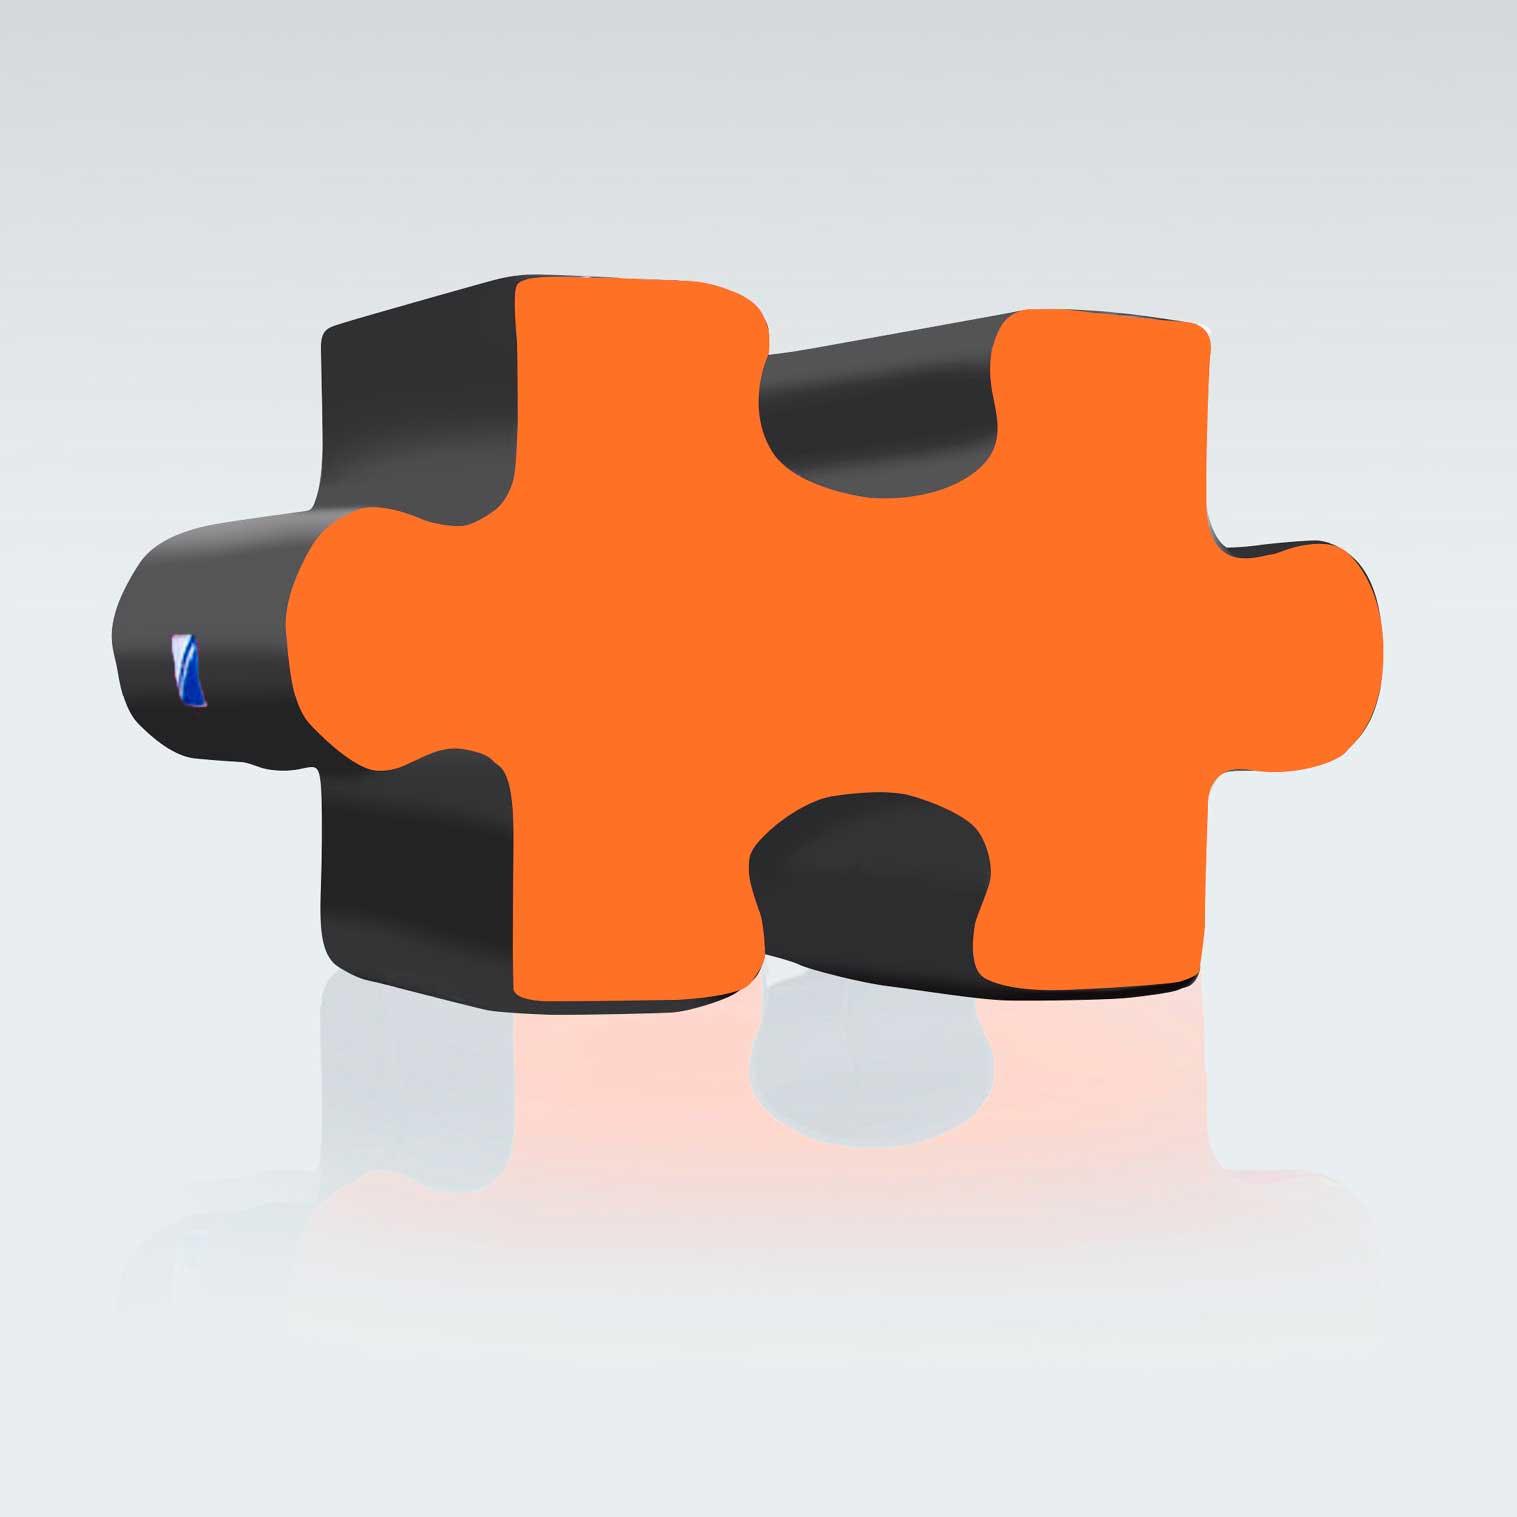 Ravensburger Spielelement - Puzzle Hocker